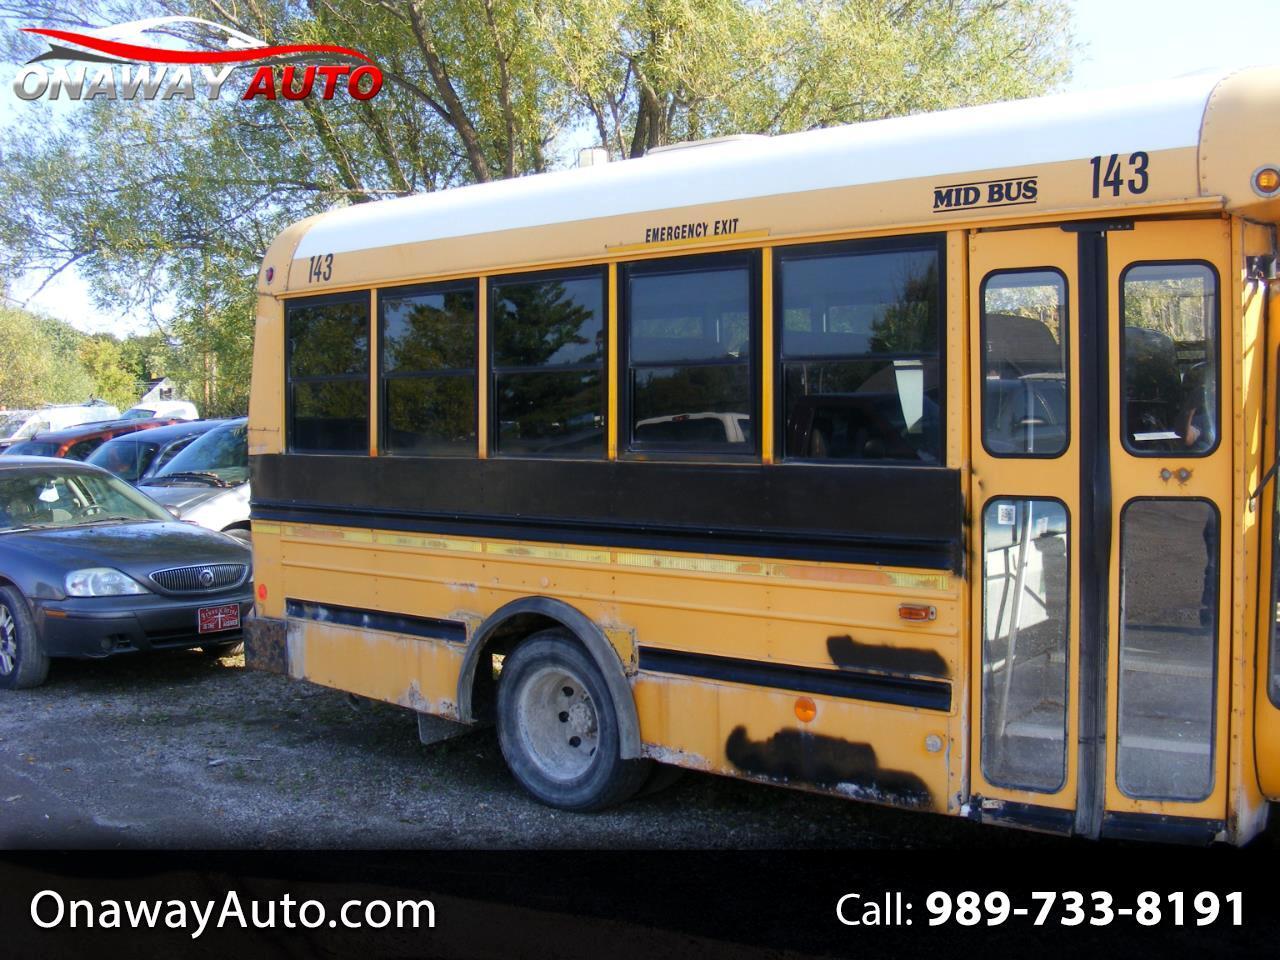 2005 Ford Econoline Commercial Cutaway E-350 Super Duty 138